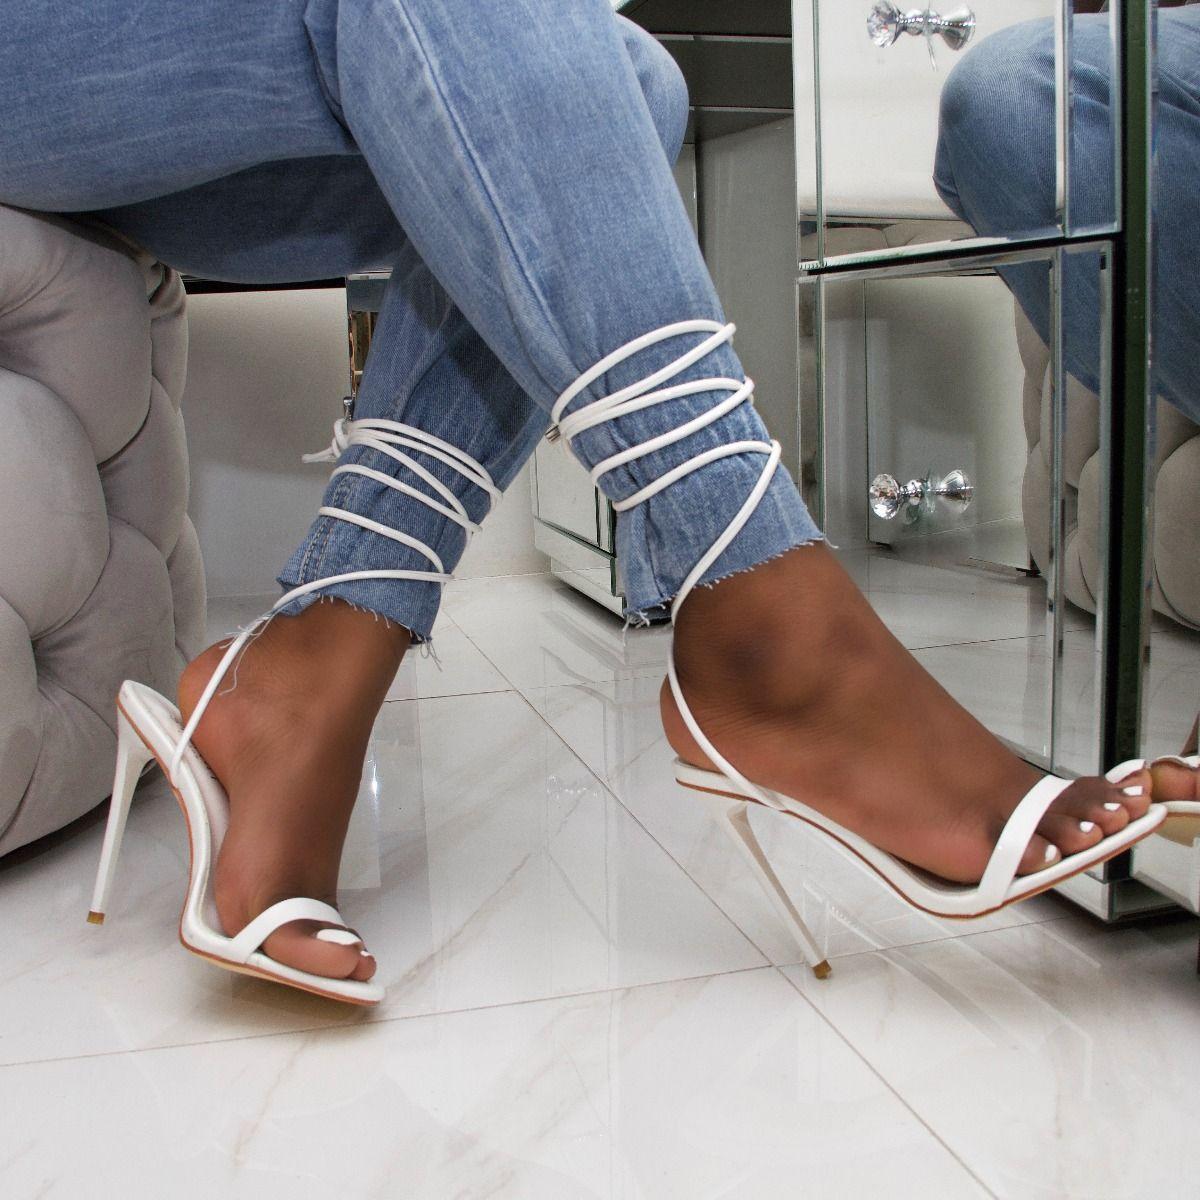 Whitney Red Patent Tie Up Stiletto Heels